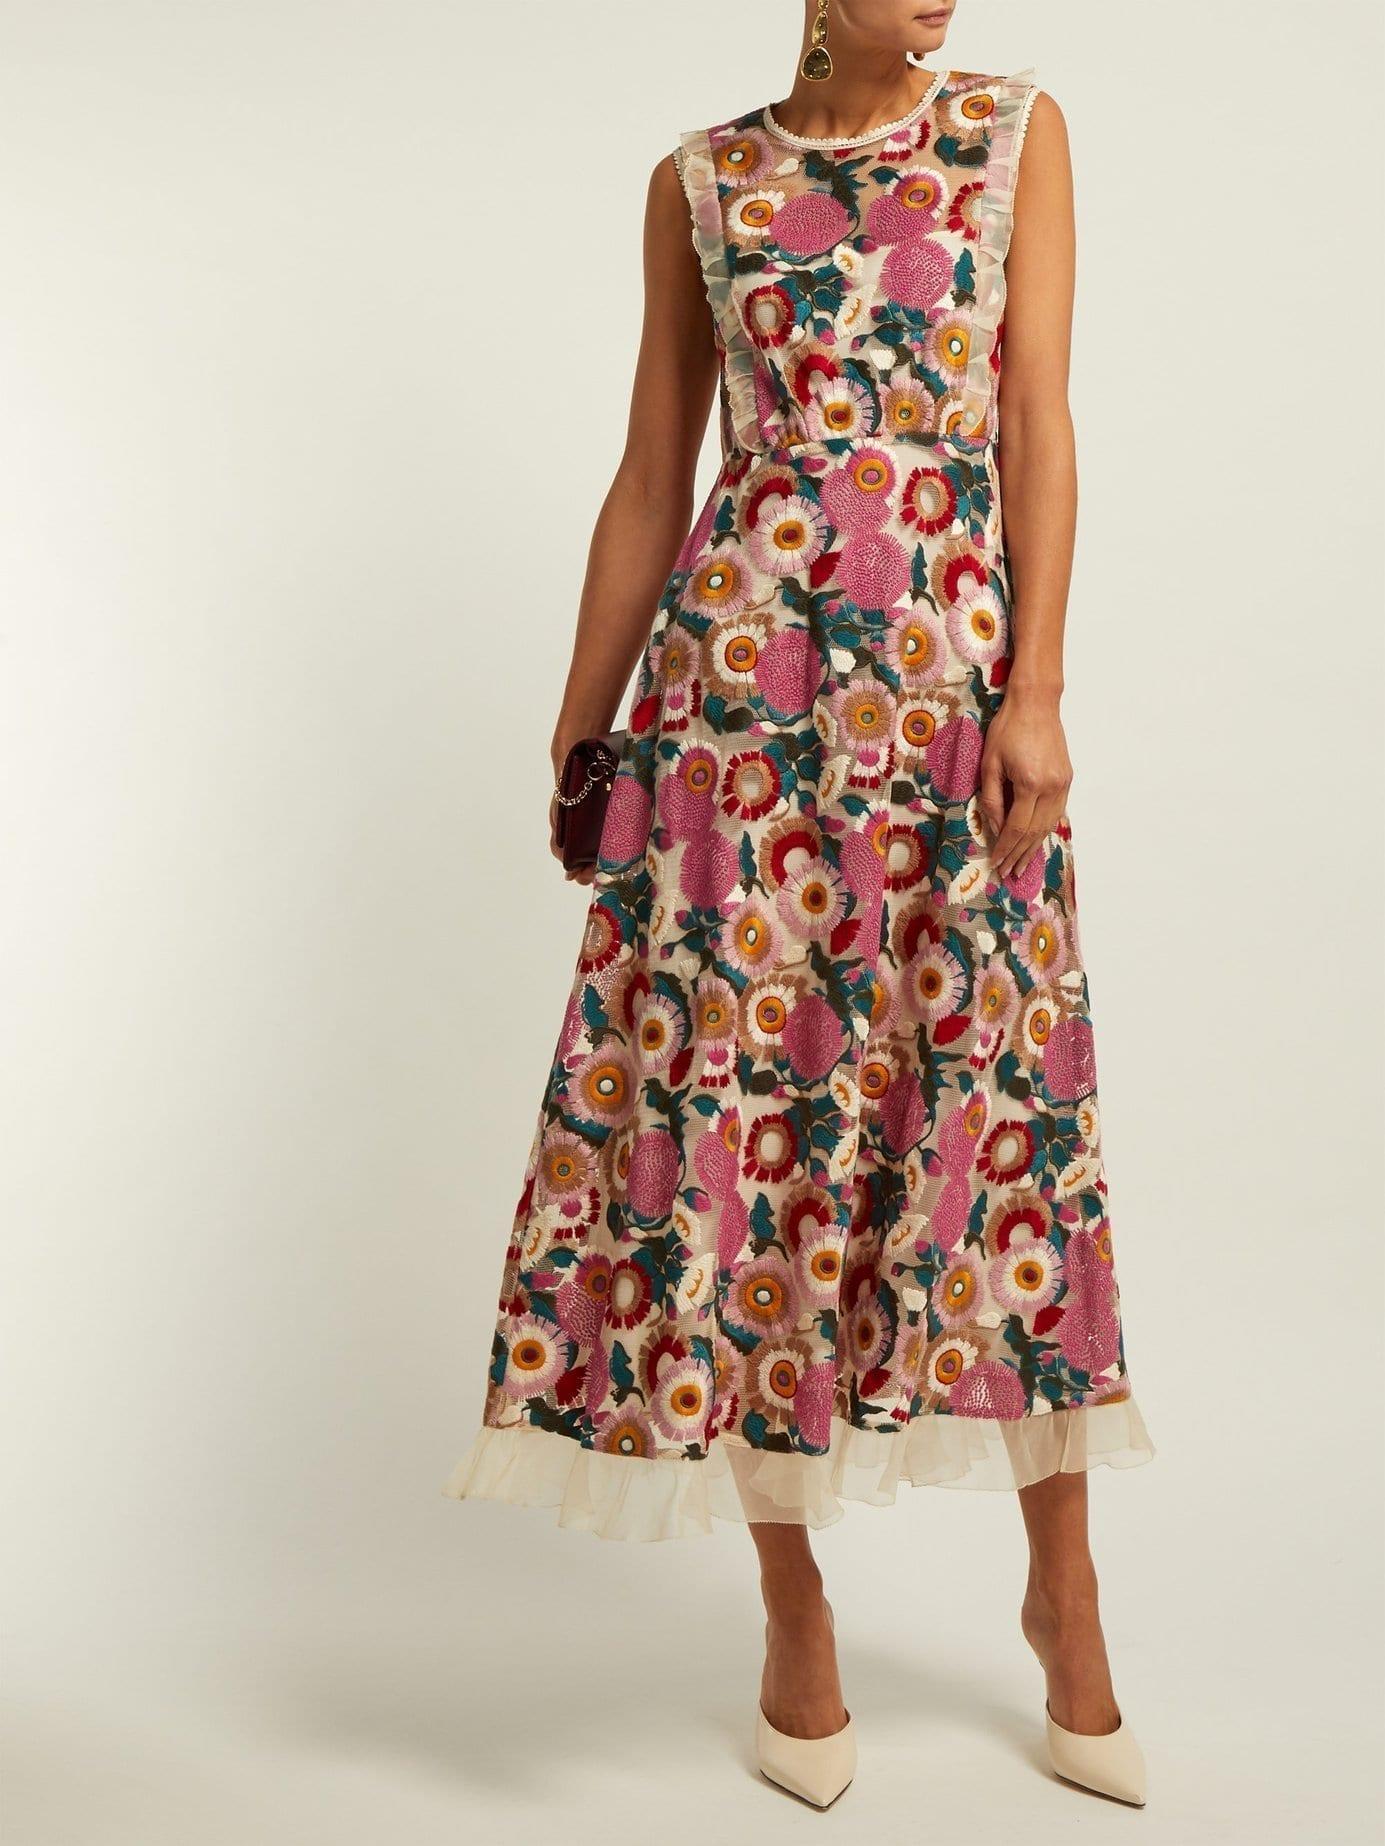 Redvalentino Floral Lace Midi Sleeveless Pink Dress